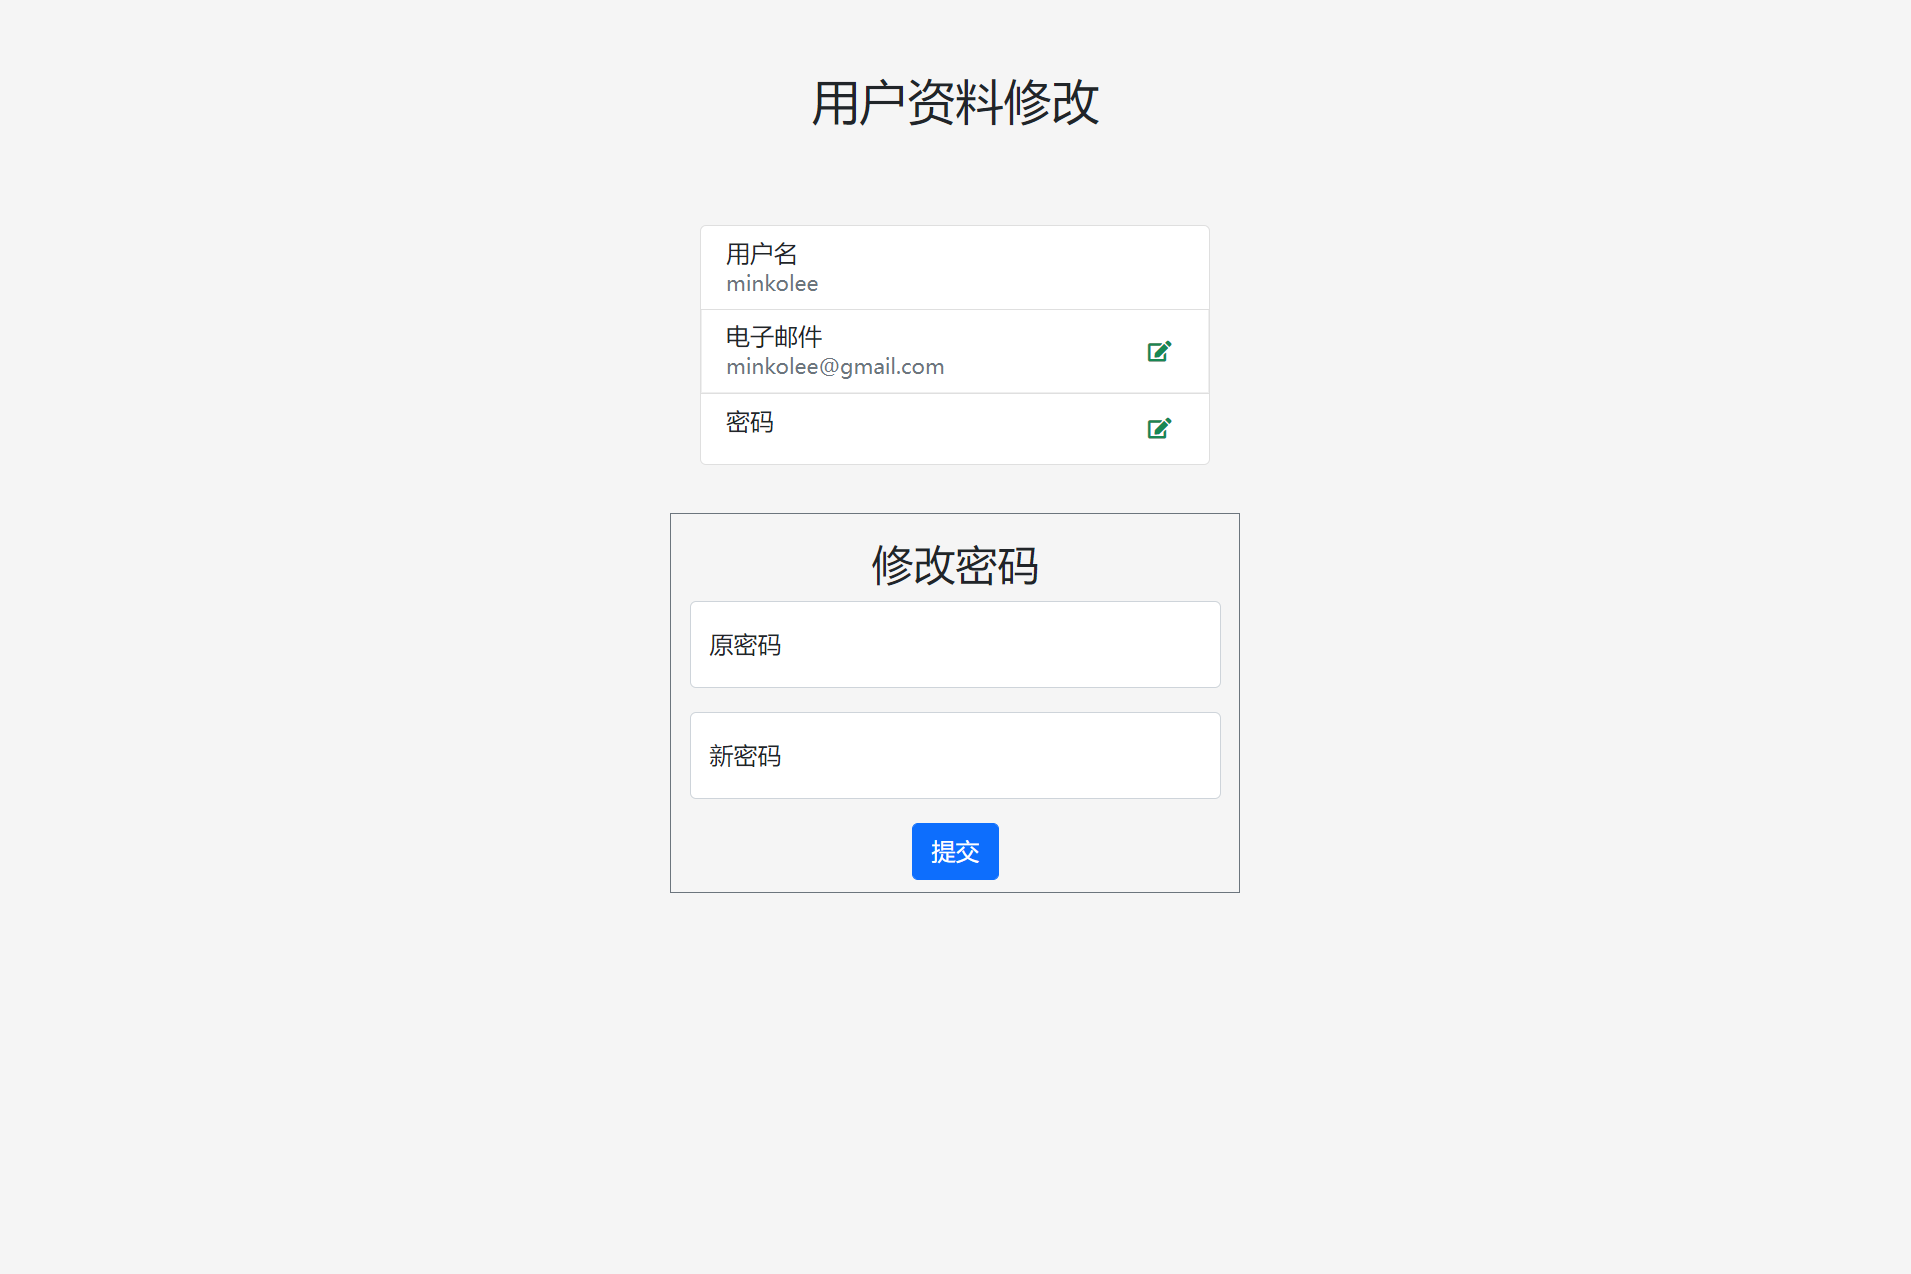 fms-profile2